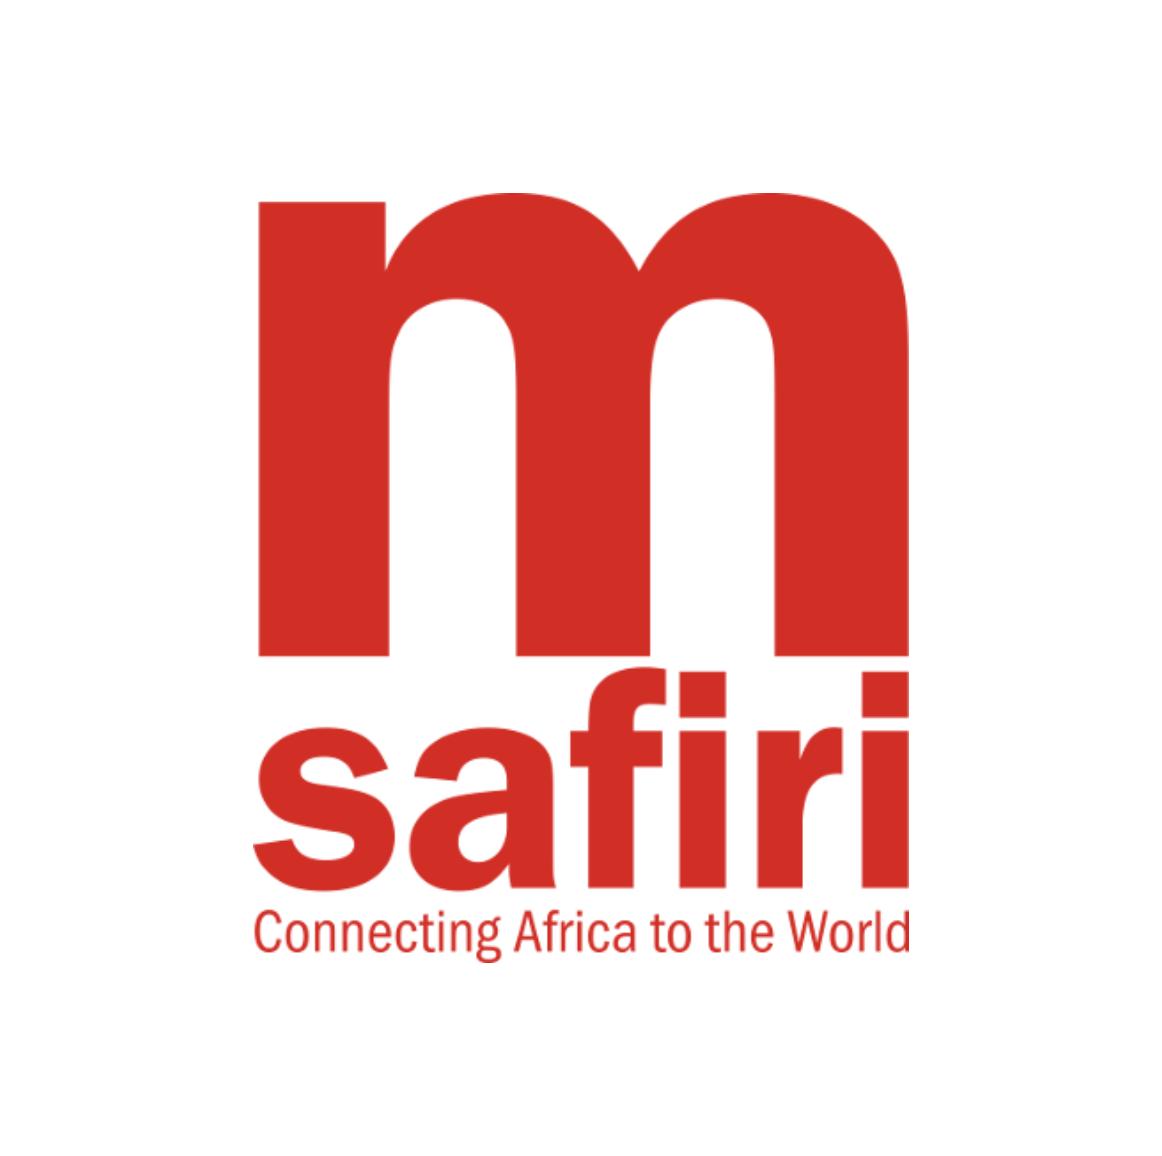 logo msafiri magazine kenya airways joost bastmeijer.png